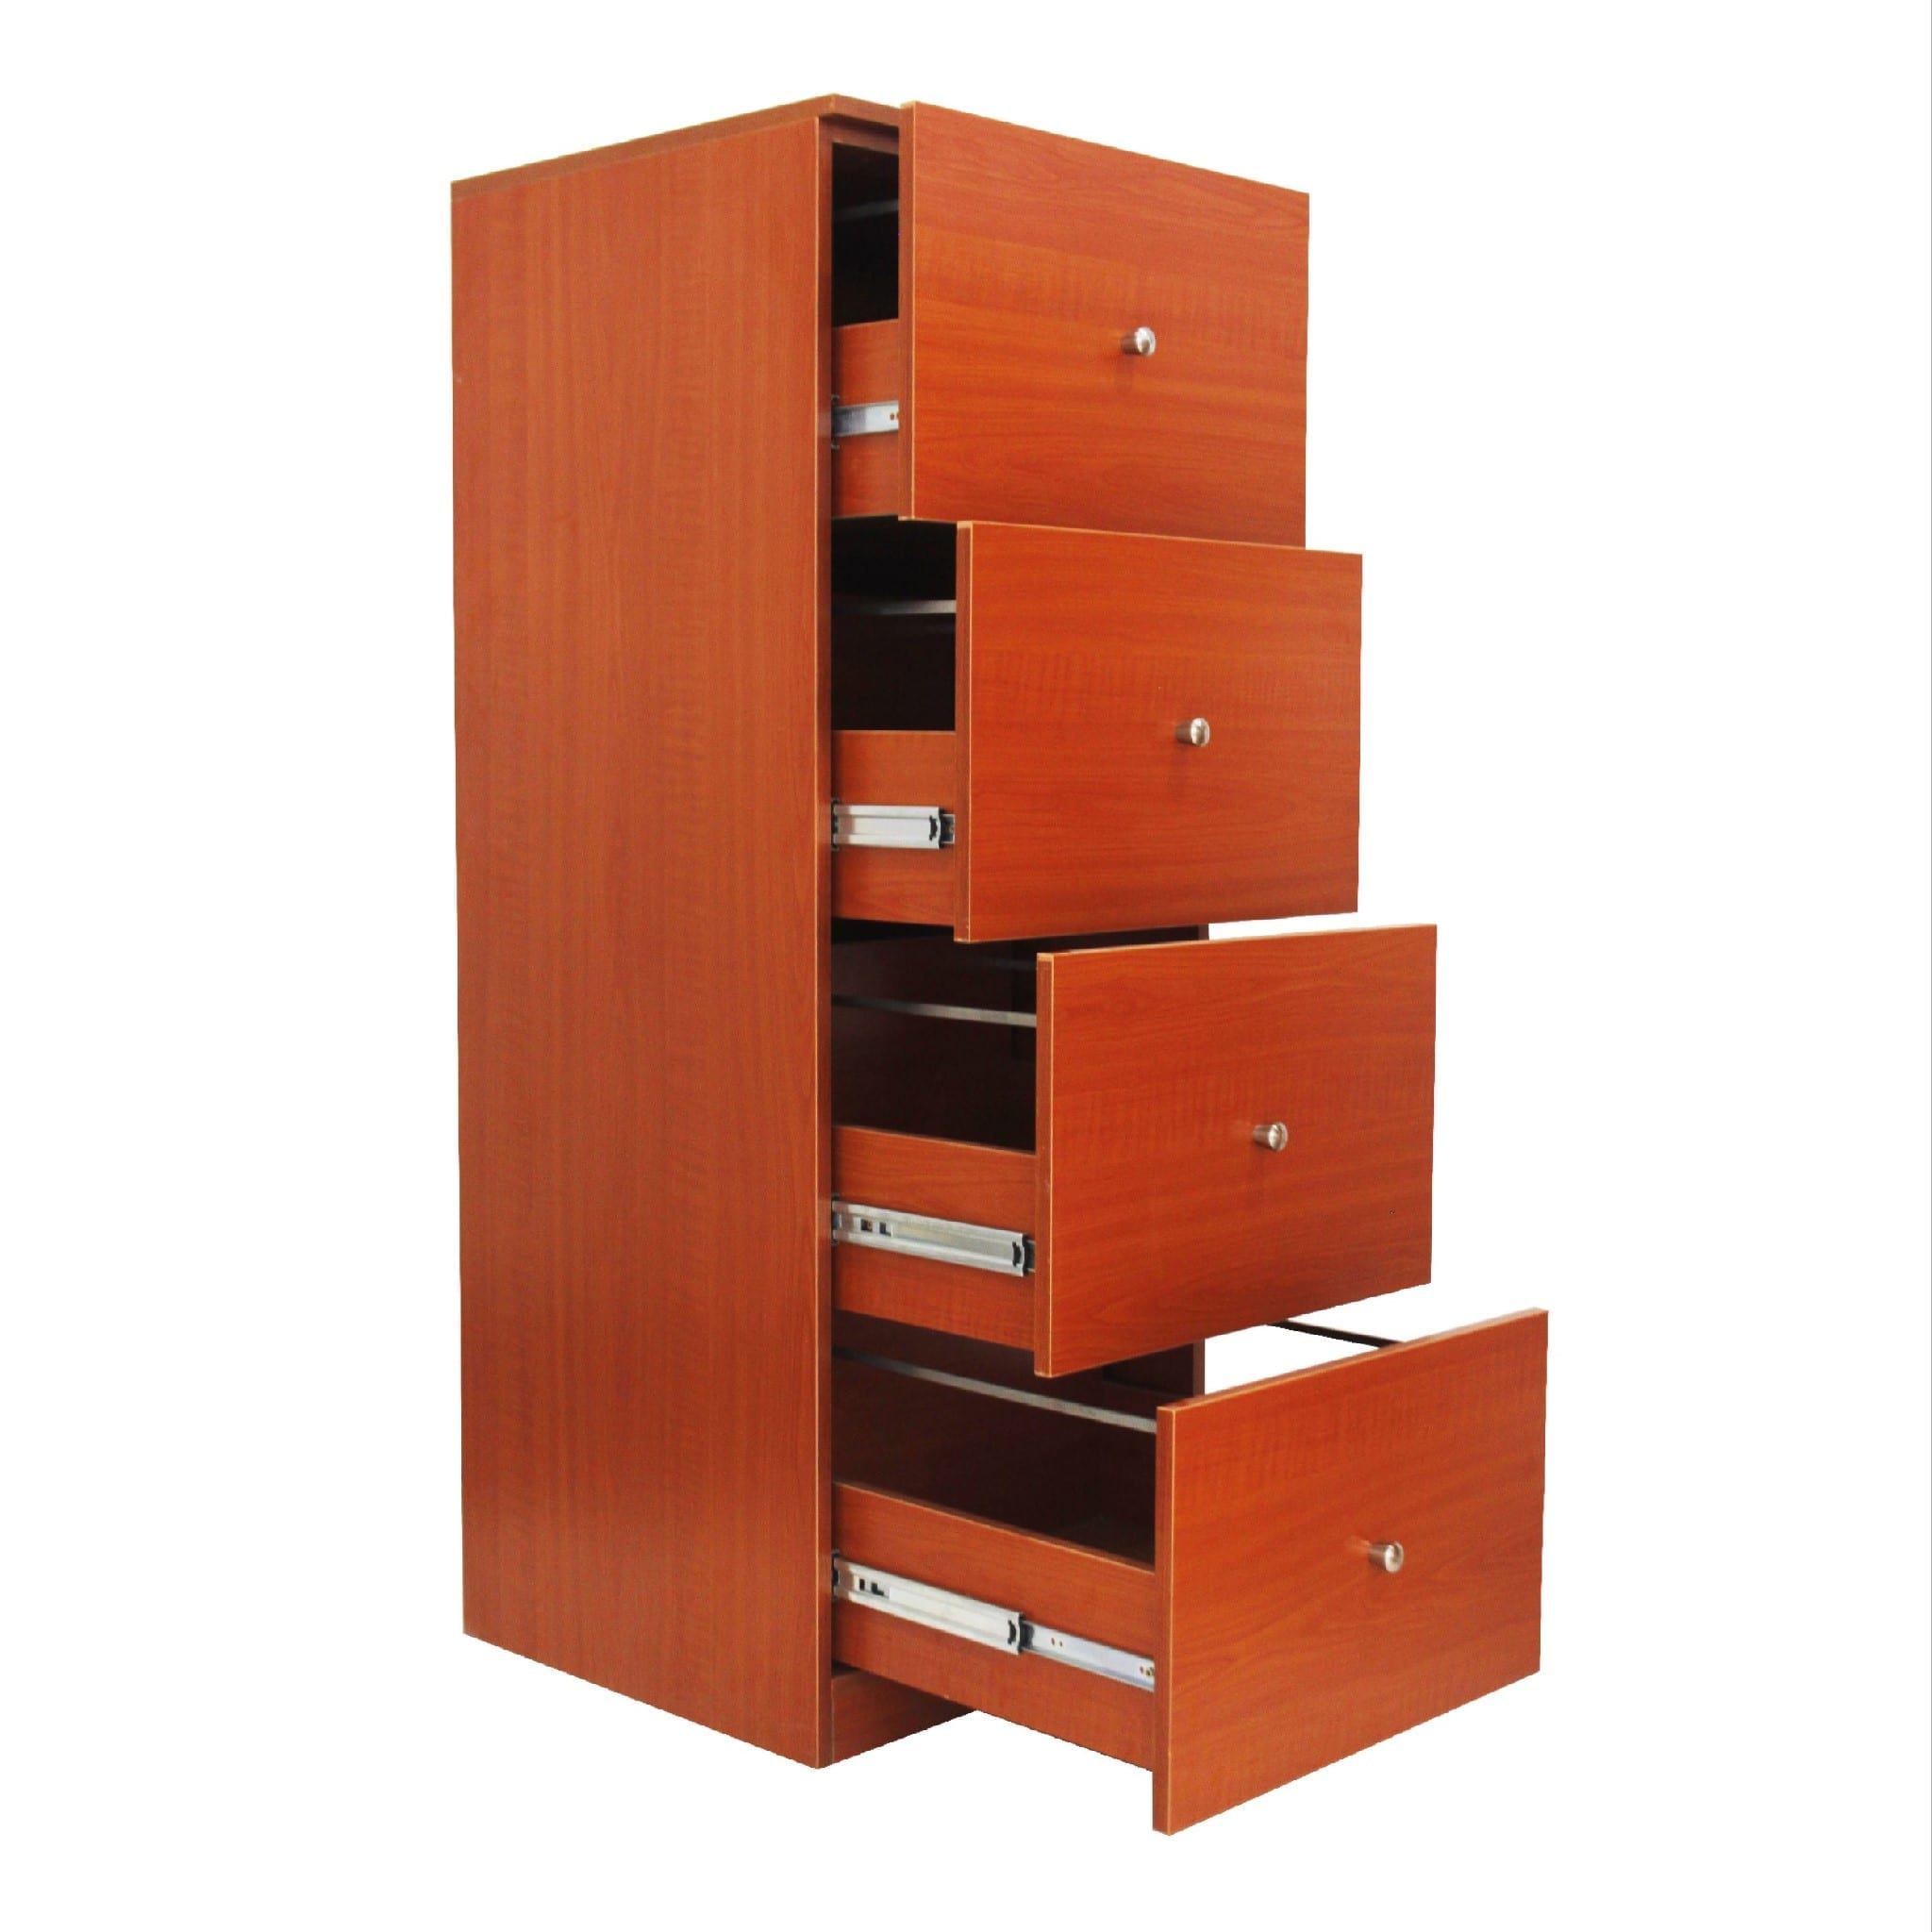 storage itm office plastic unit organizer drawers cabinet s bedroom drawer